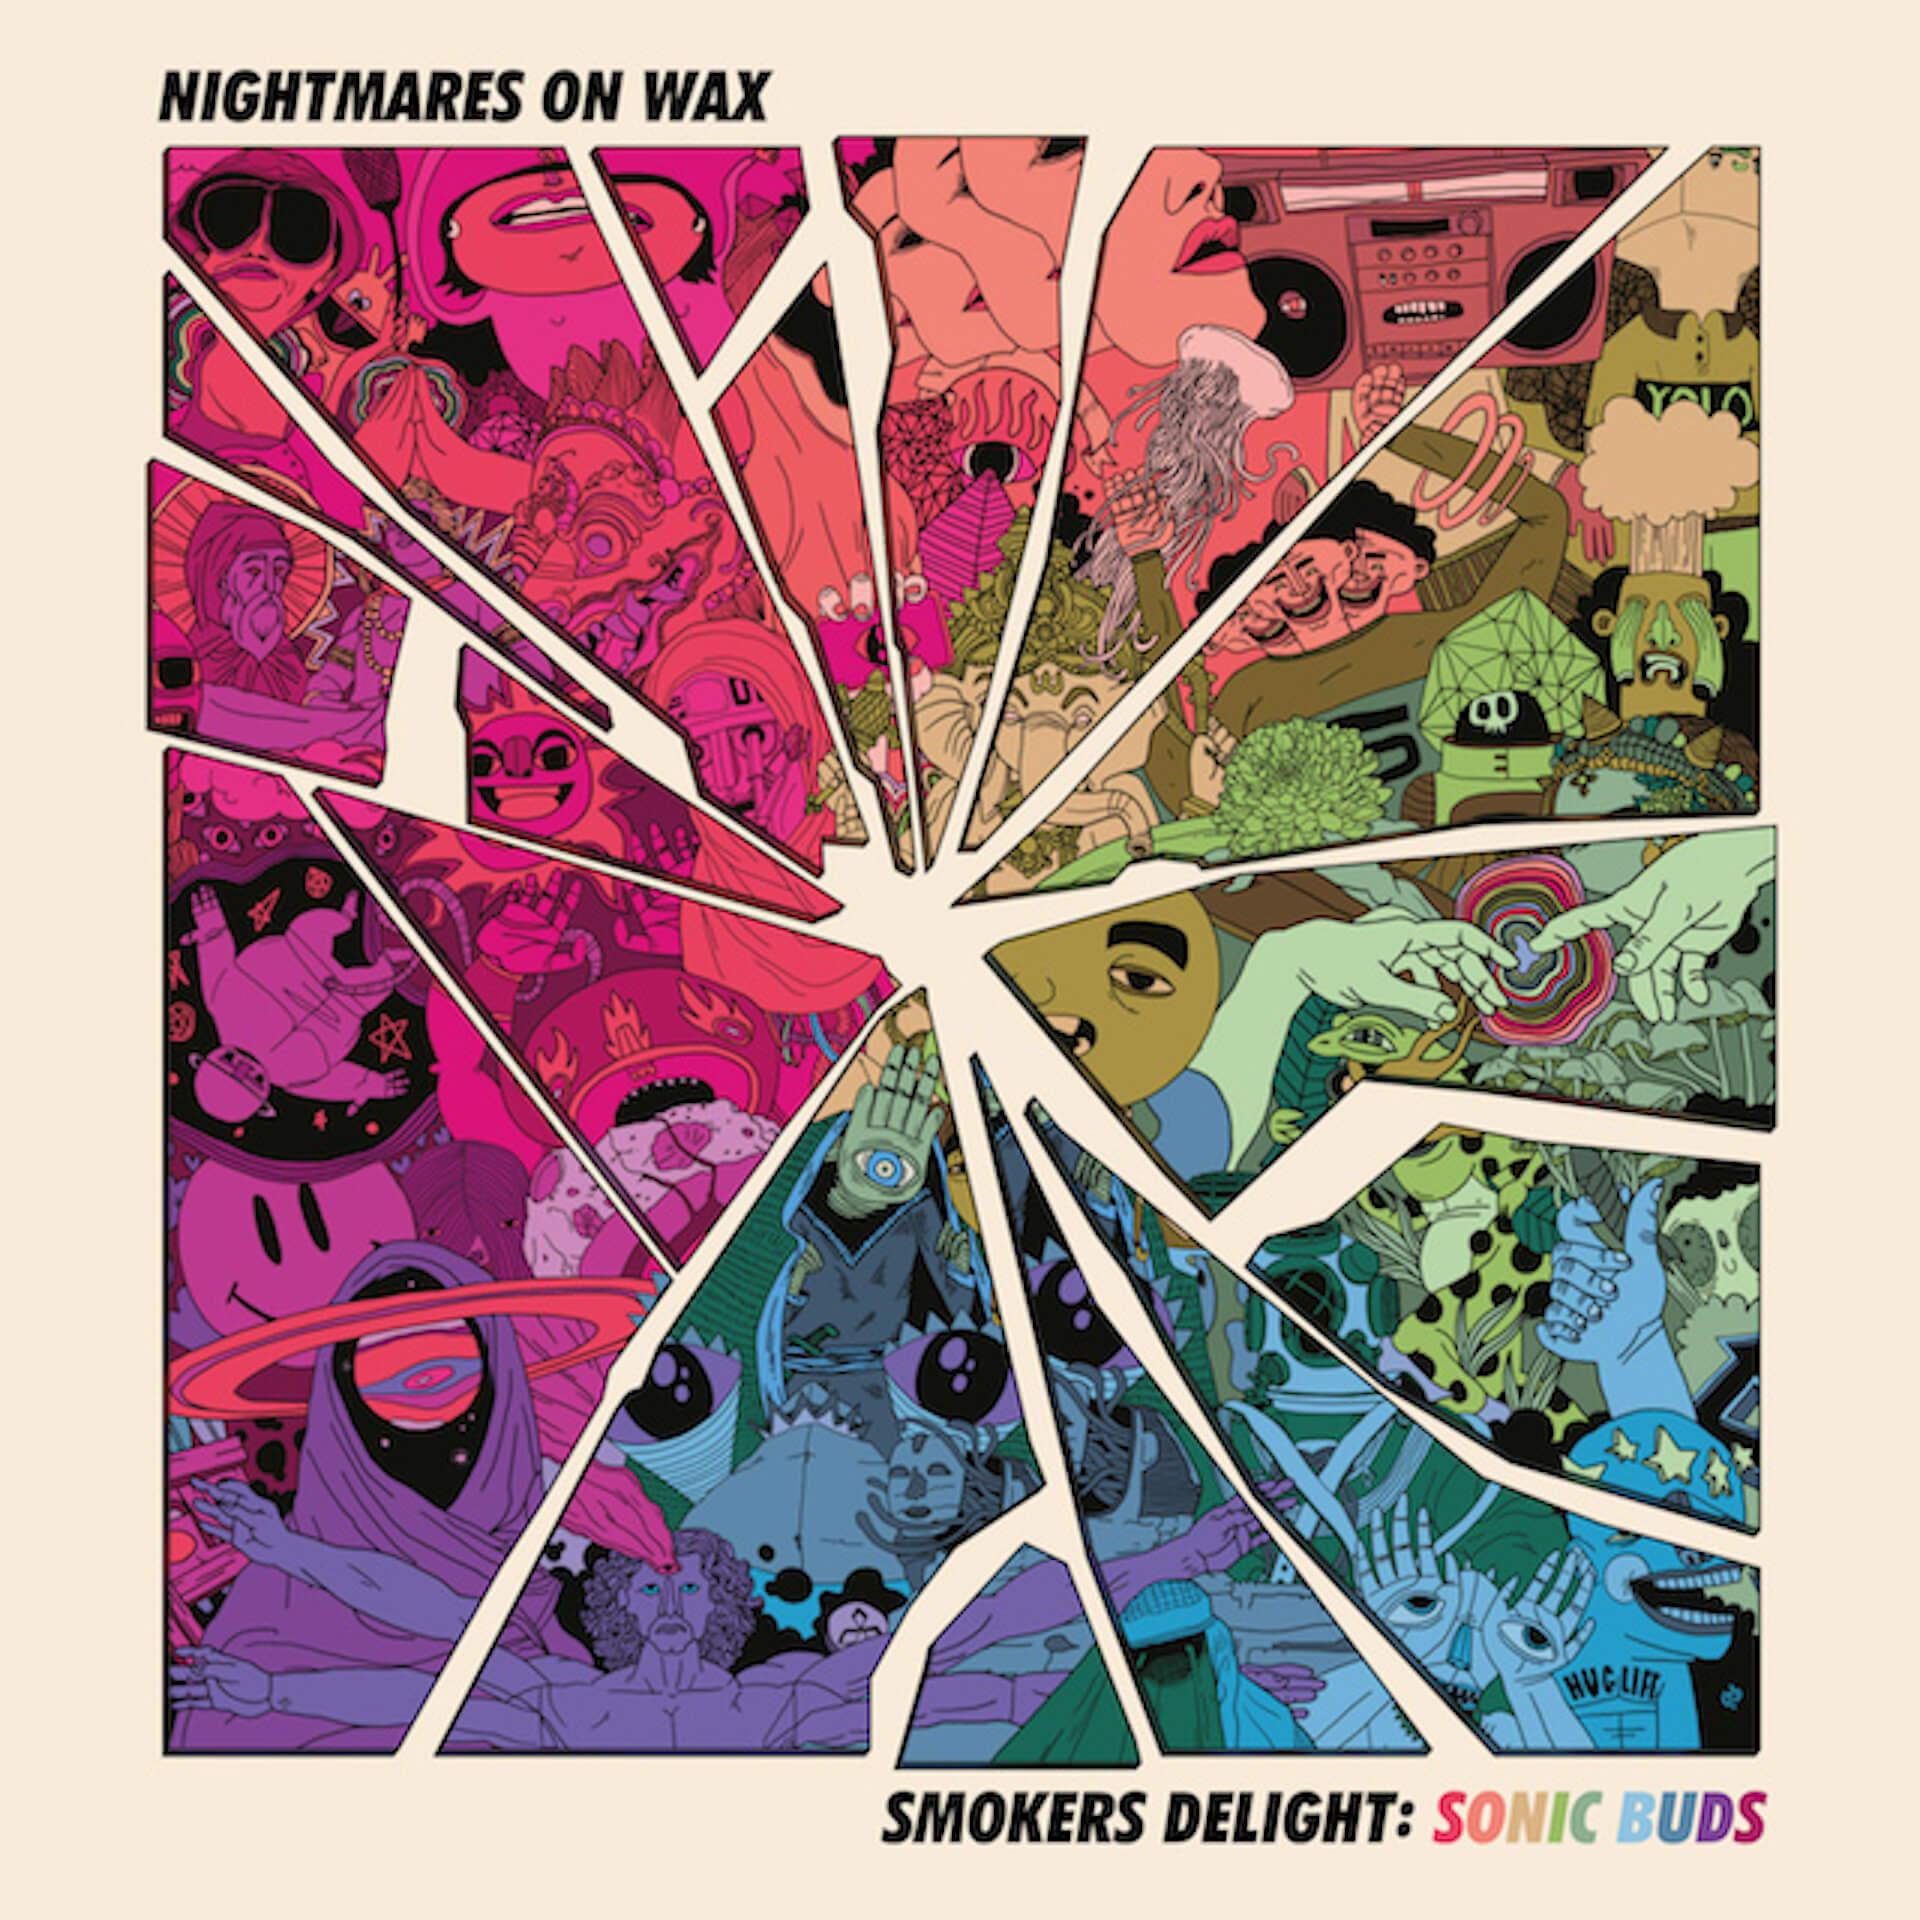 Nightmares On Wax本人が見た夢にインスパイアされたショートフィルムが公開!歴史的名盤に新曲を追加した12インチ『Smokers Delight: Sonic Buds』が本日リリース music201016_nightmaresonwax_1